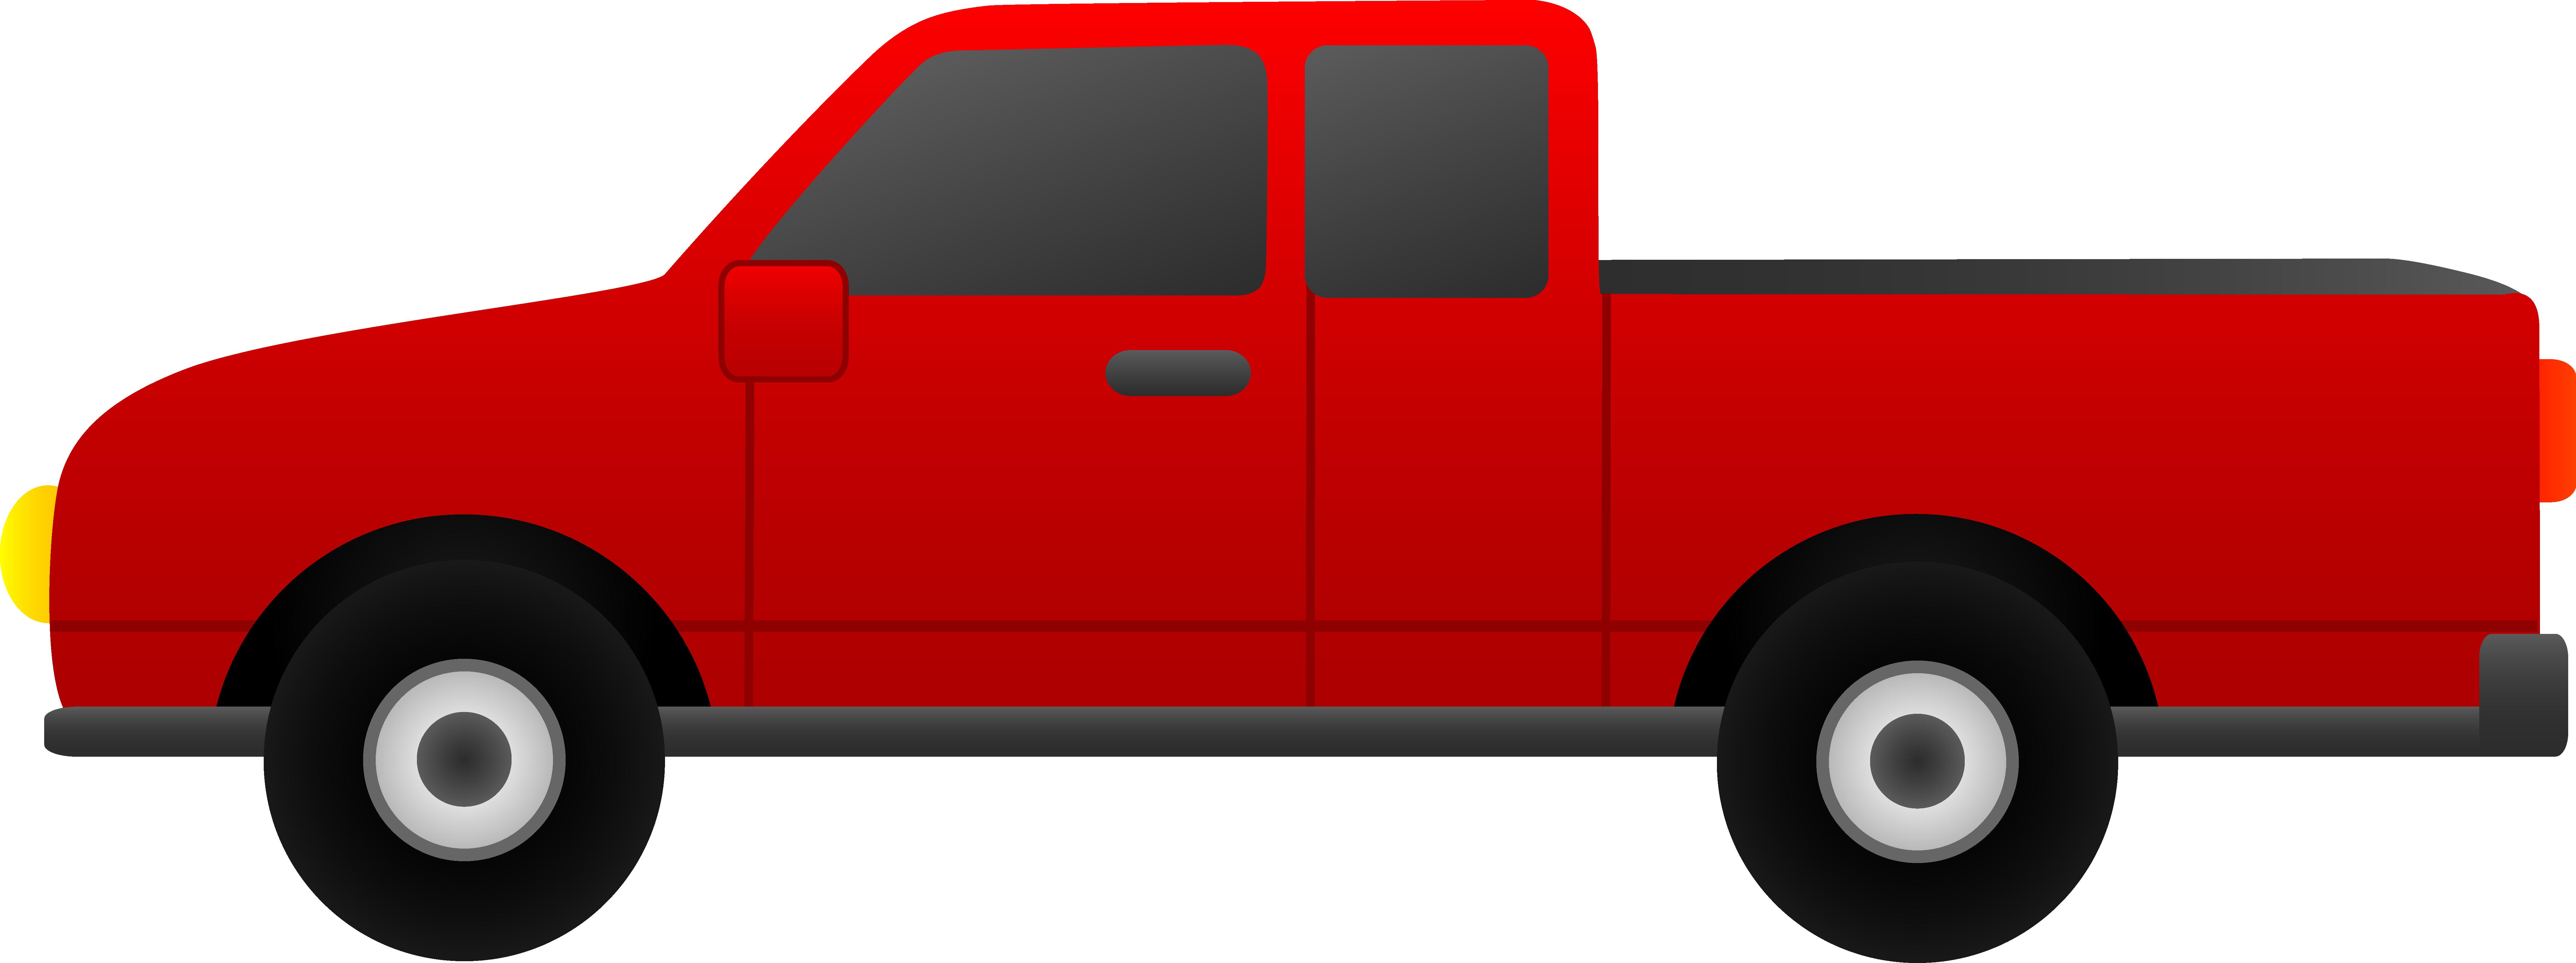 8576x3207 Vehicle Clipart Truck